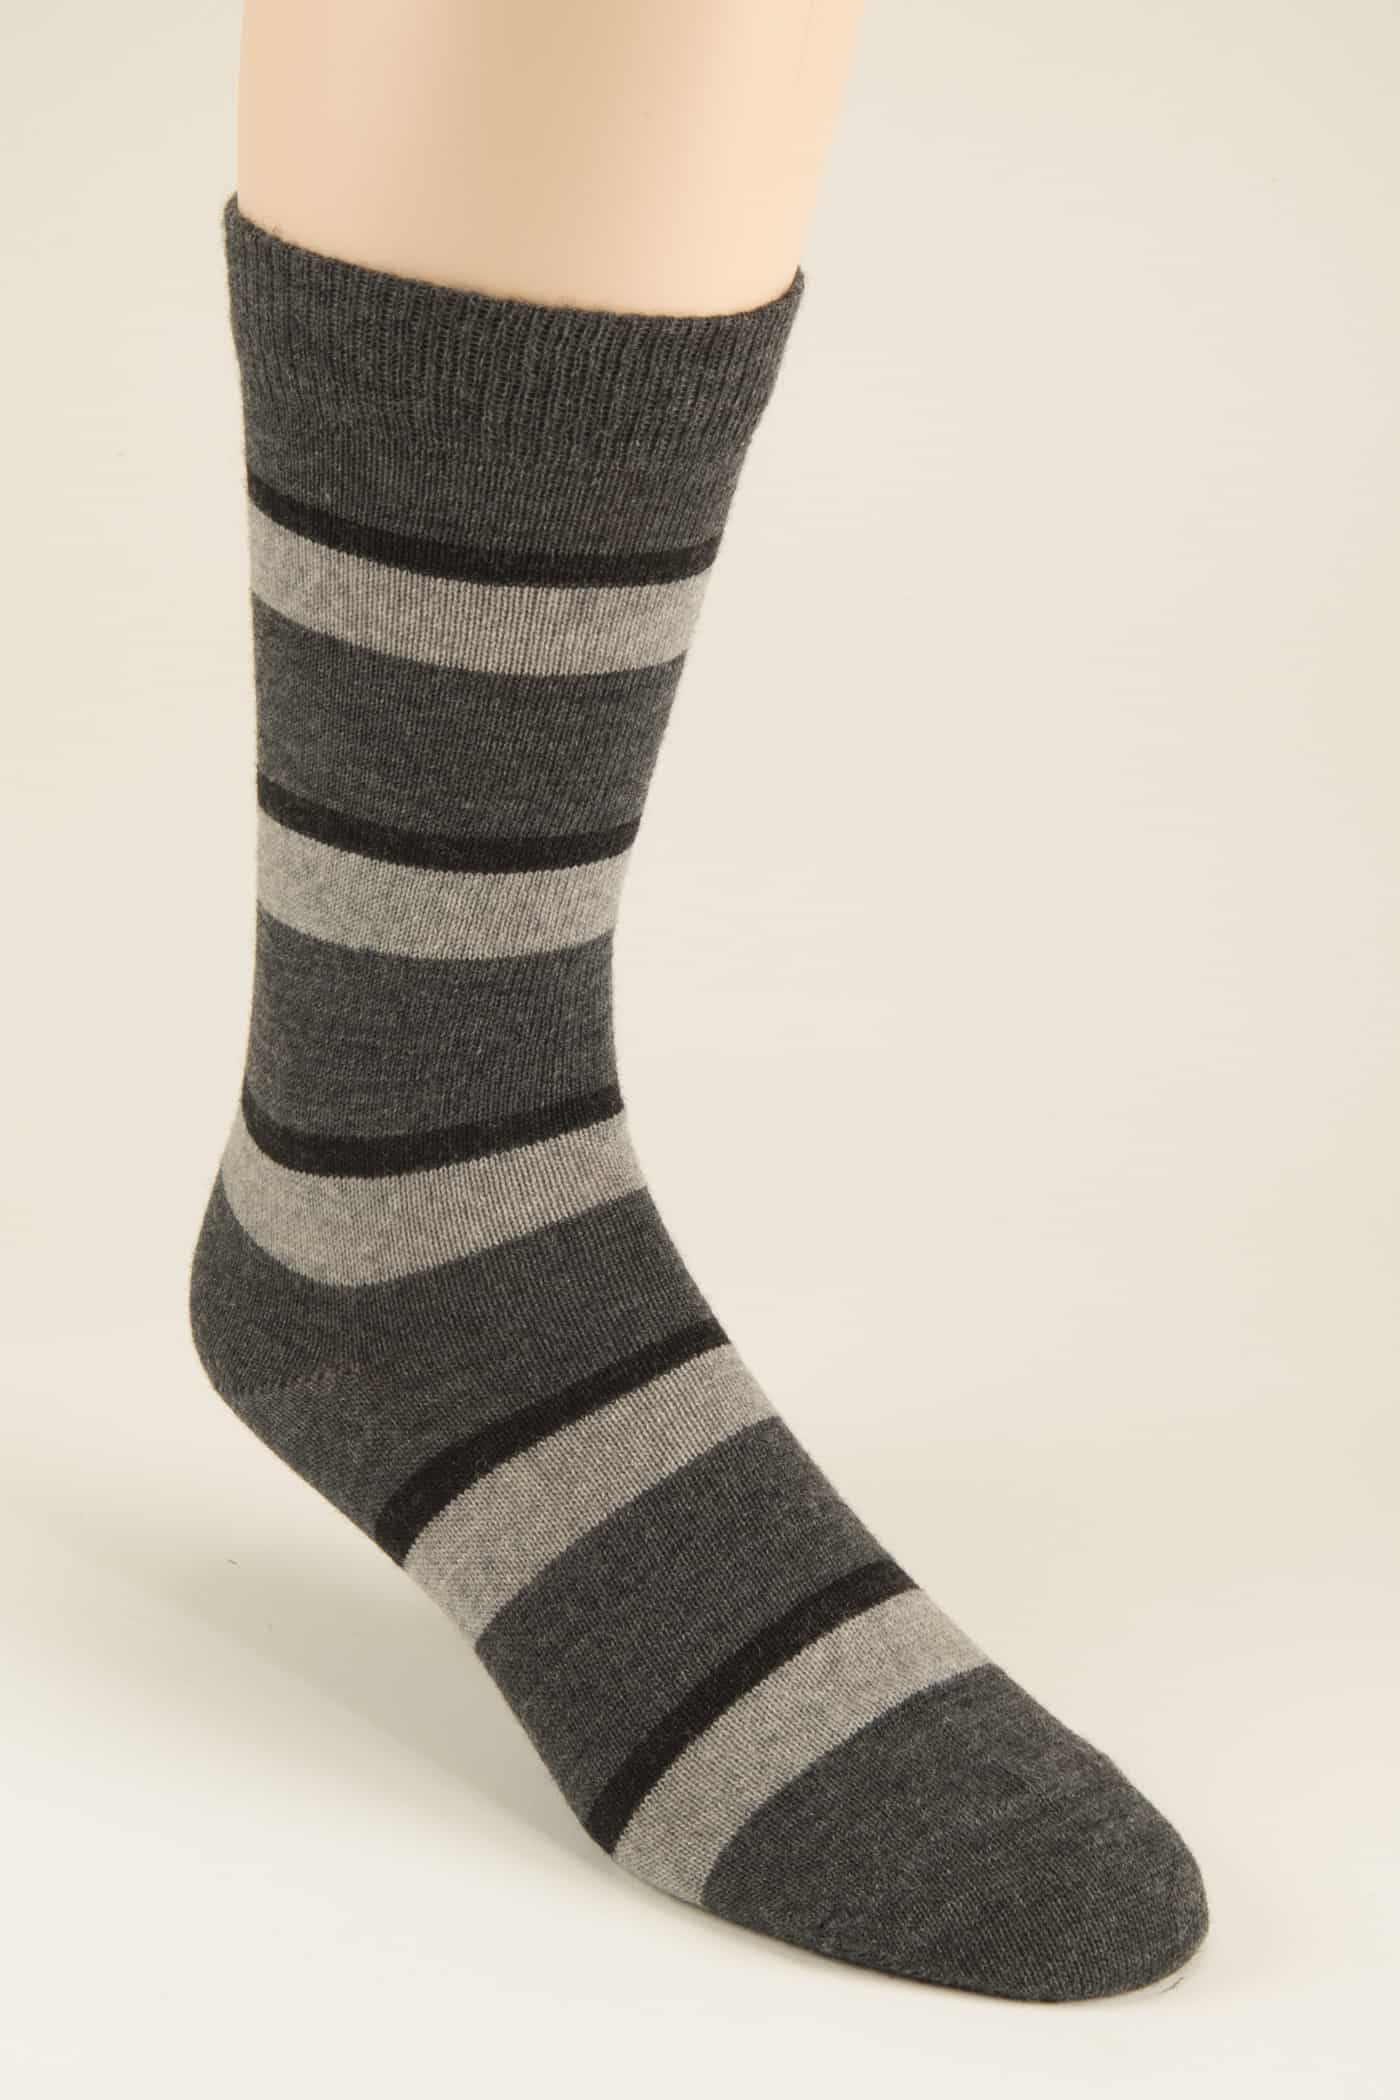 Matlock-F-Grey-Charcoal